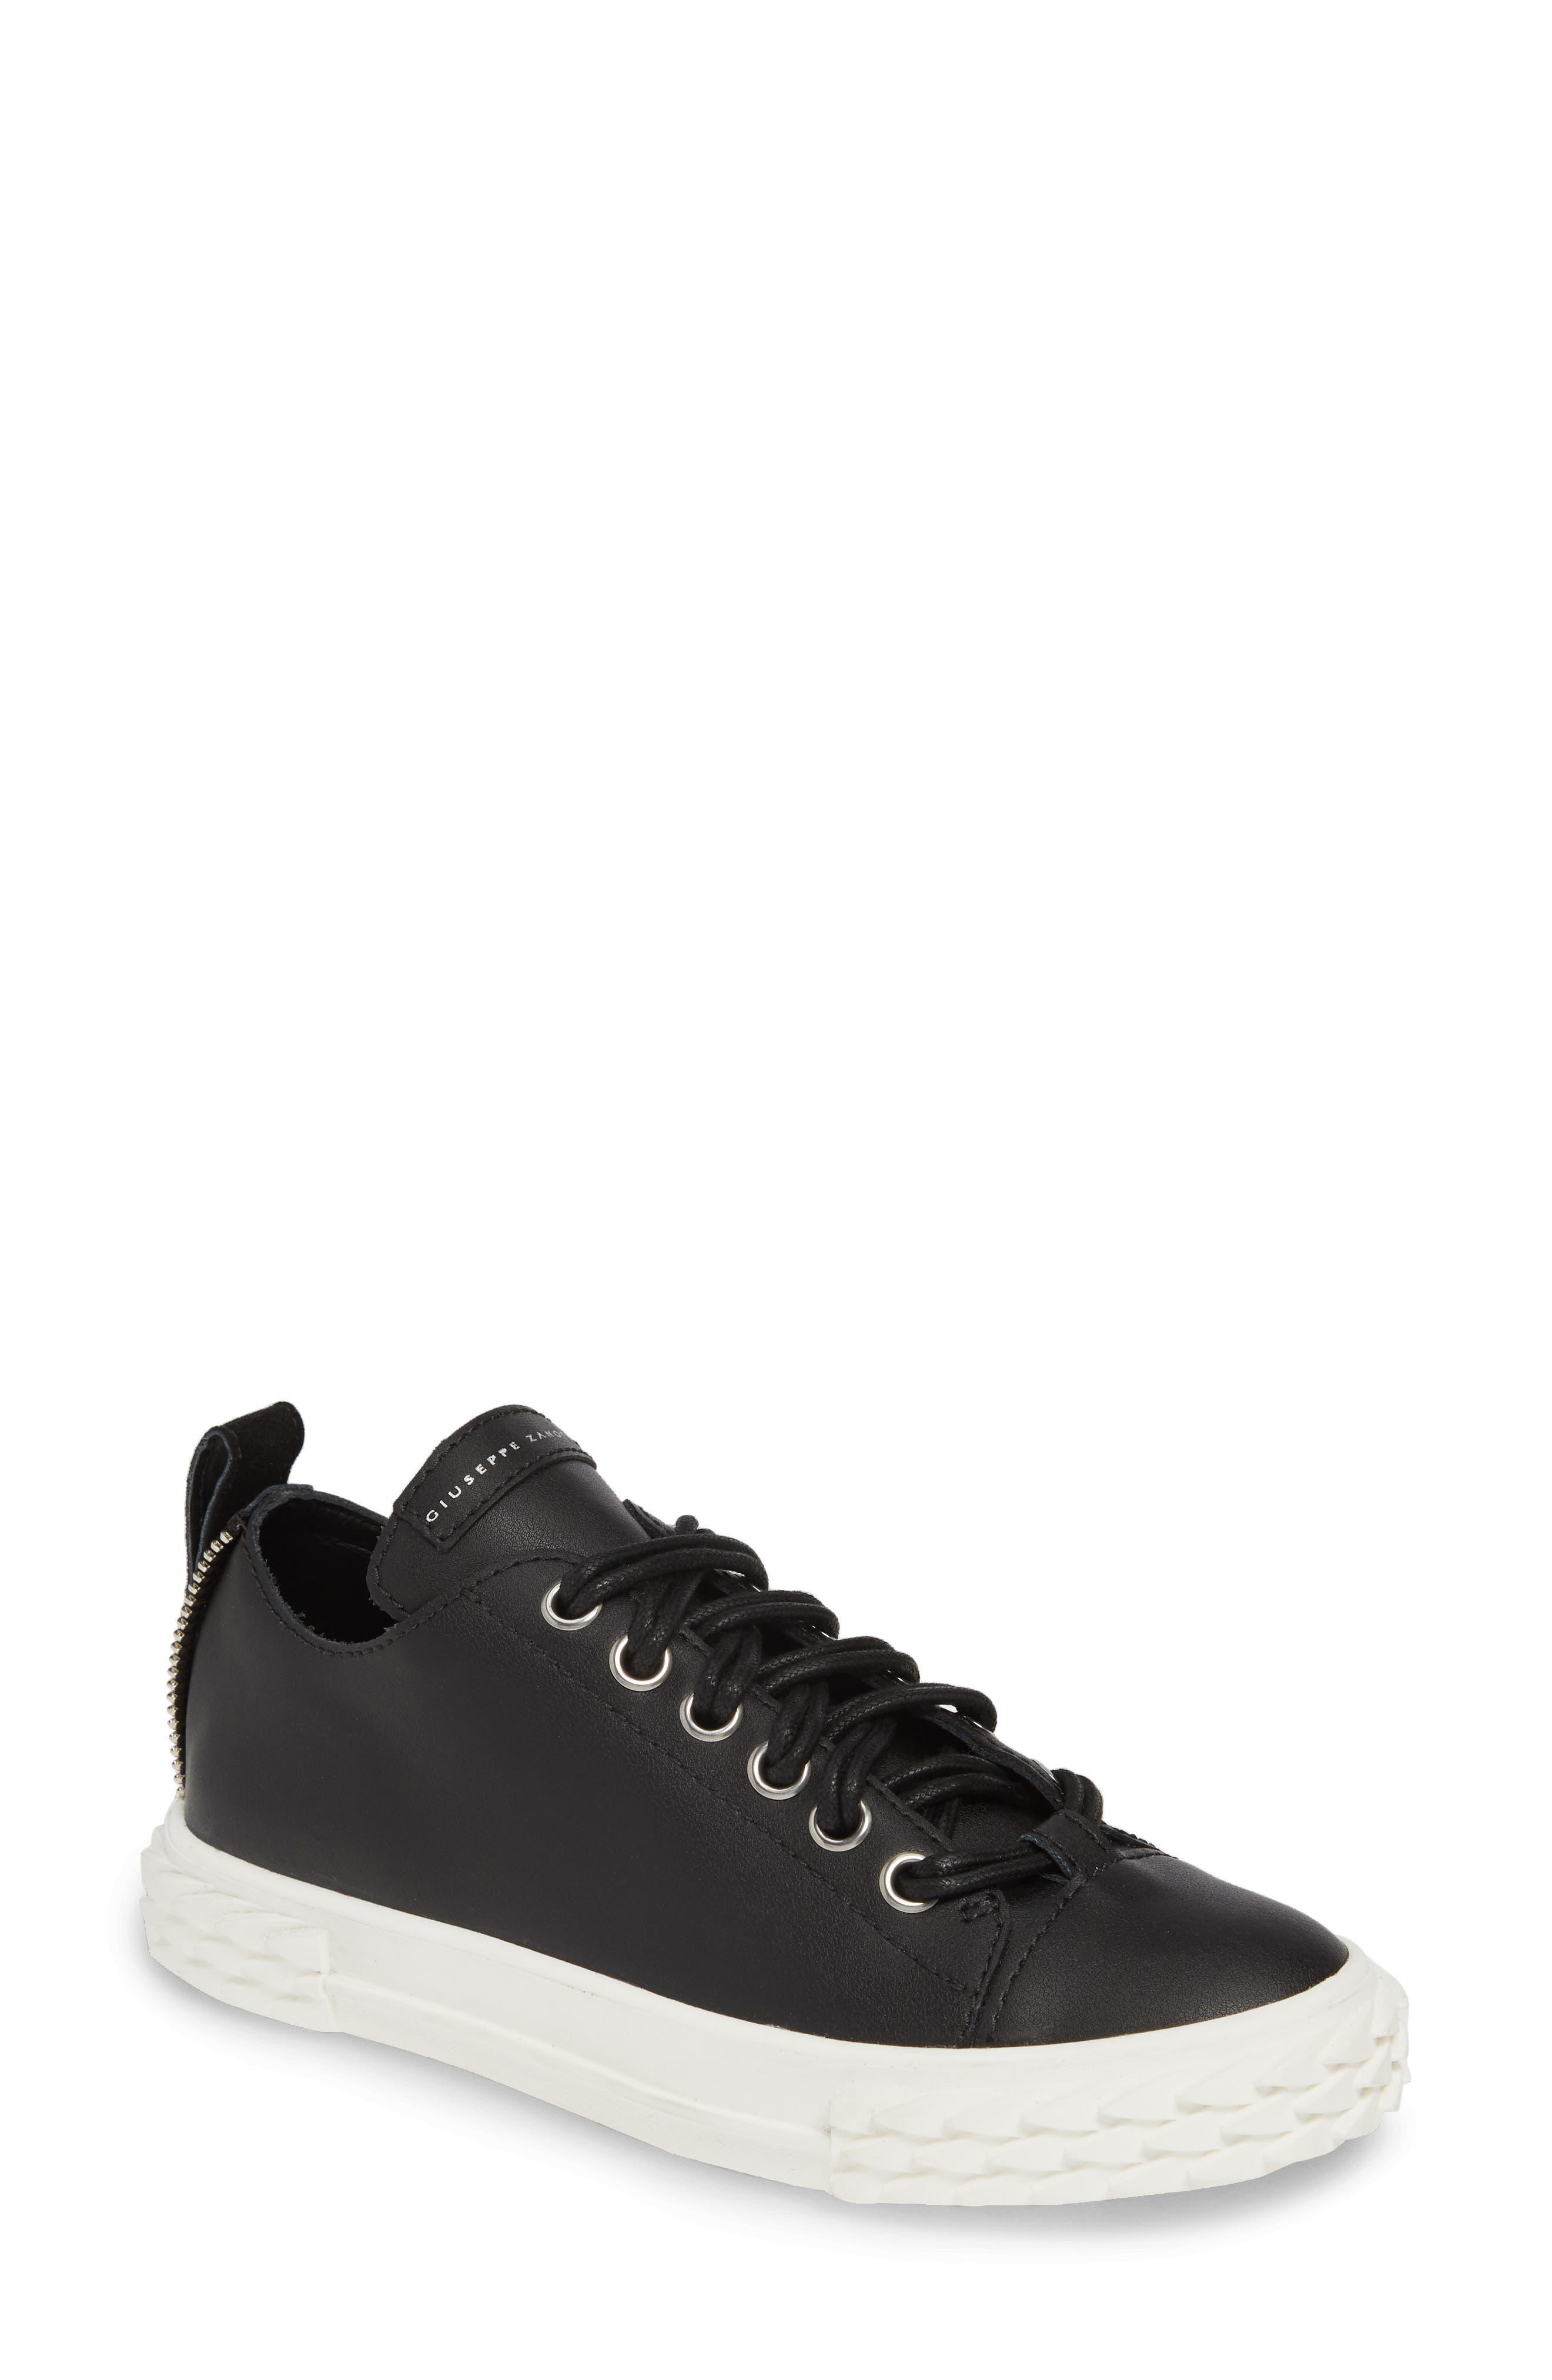 Giuseppe Zanotti Scale Sneaker, Black